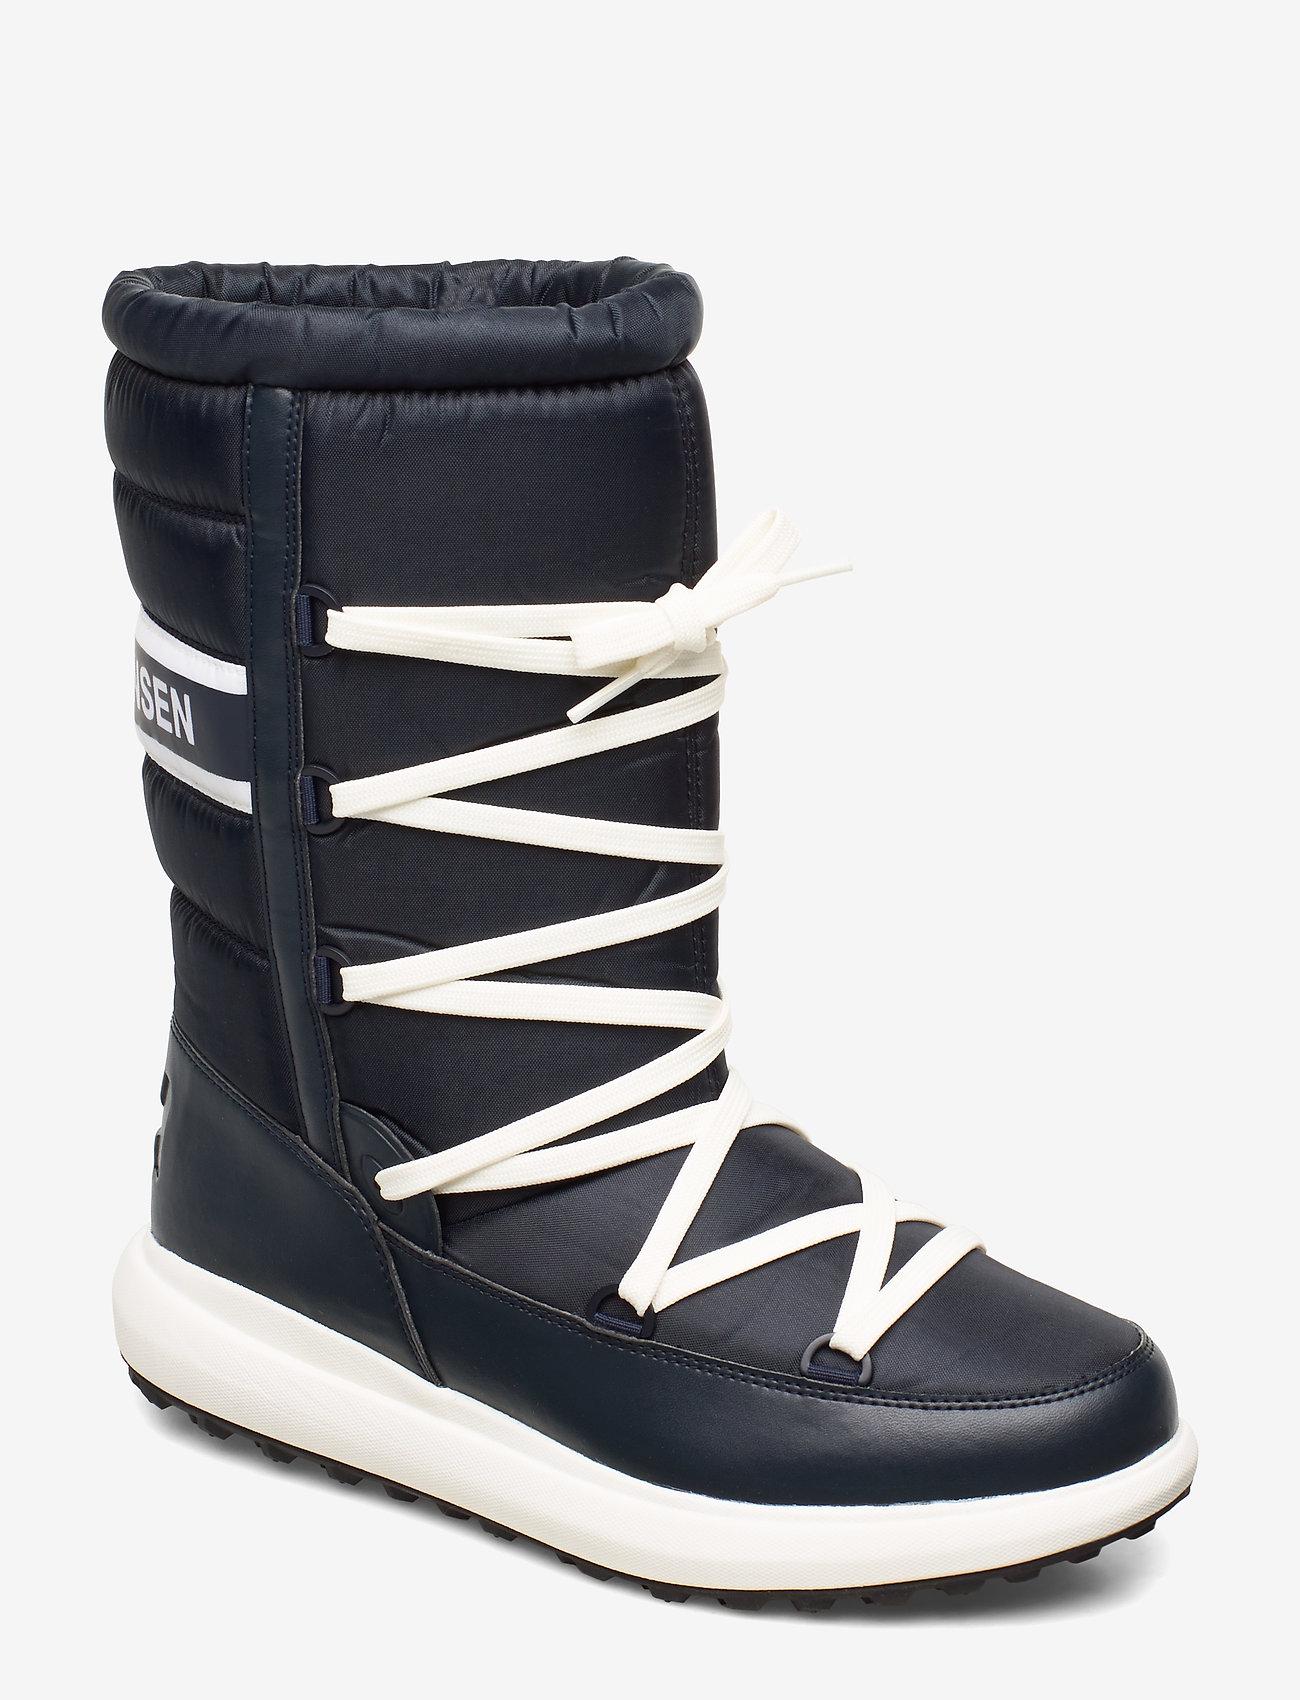 Helly Hansen - ISOLA GRAND - buty zimowe - navy / off white / black - 0